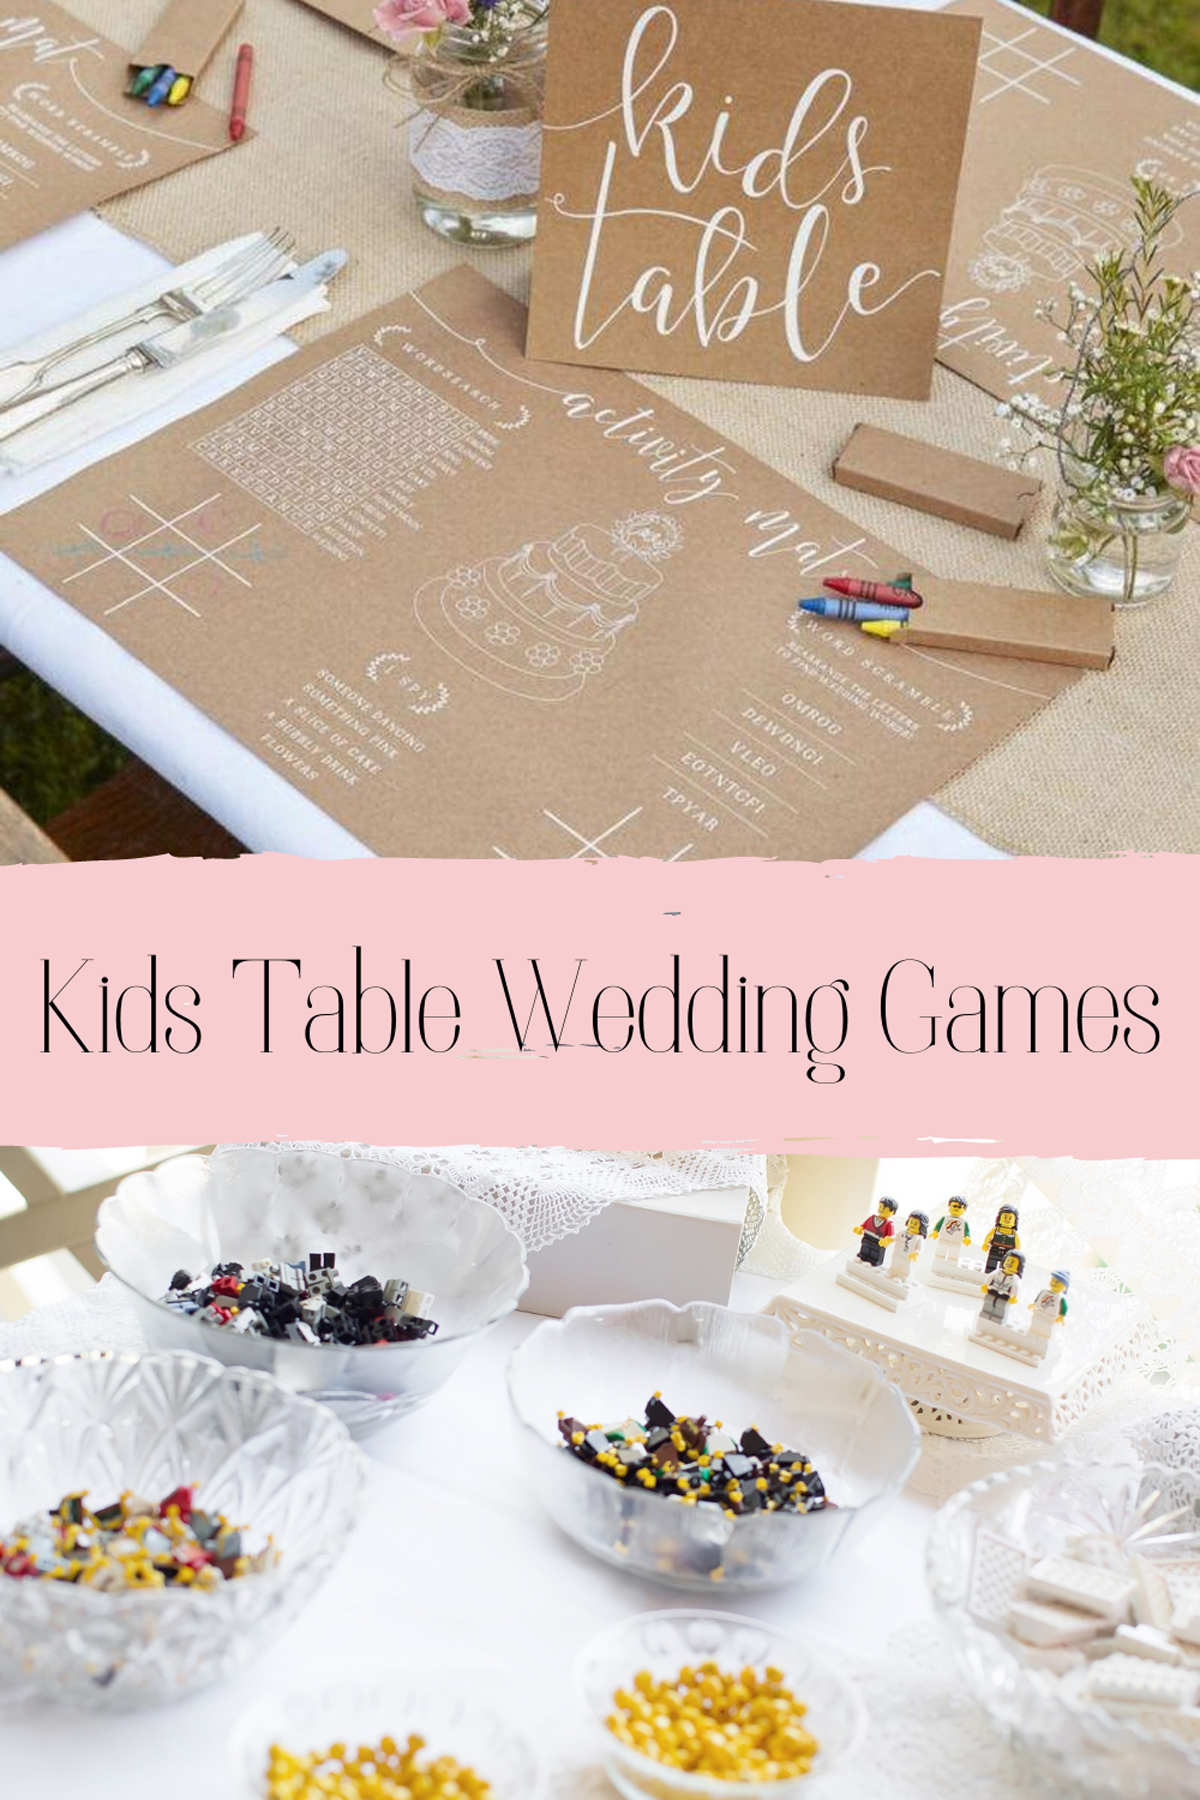 Kids Table Wedding Games